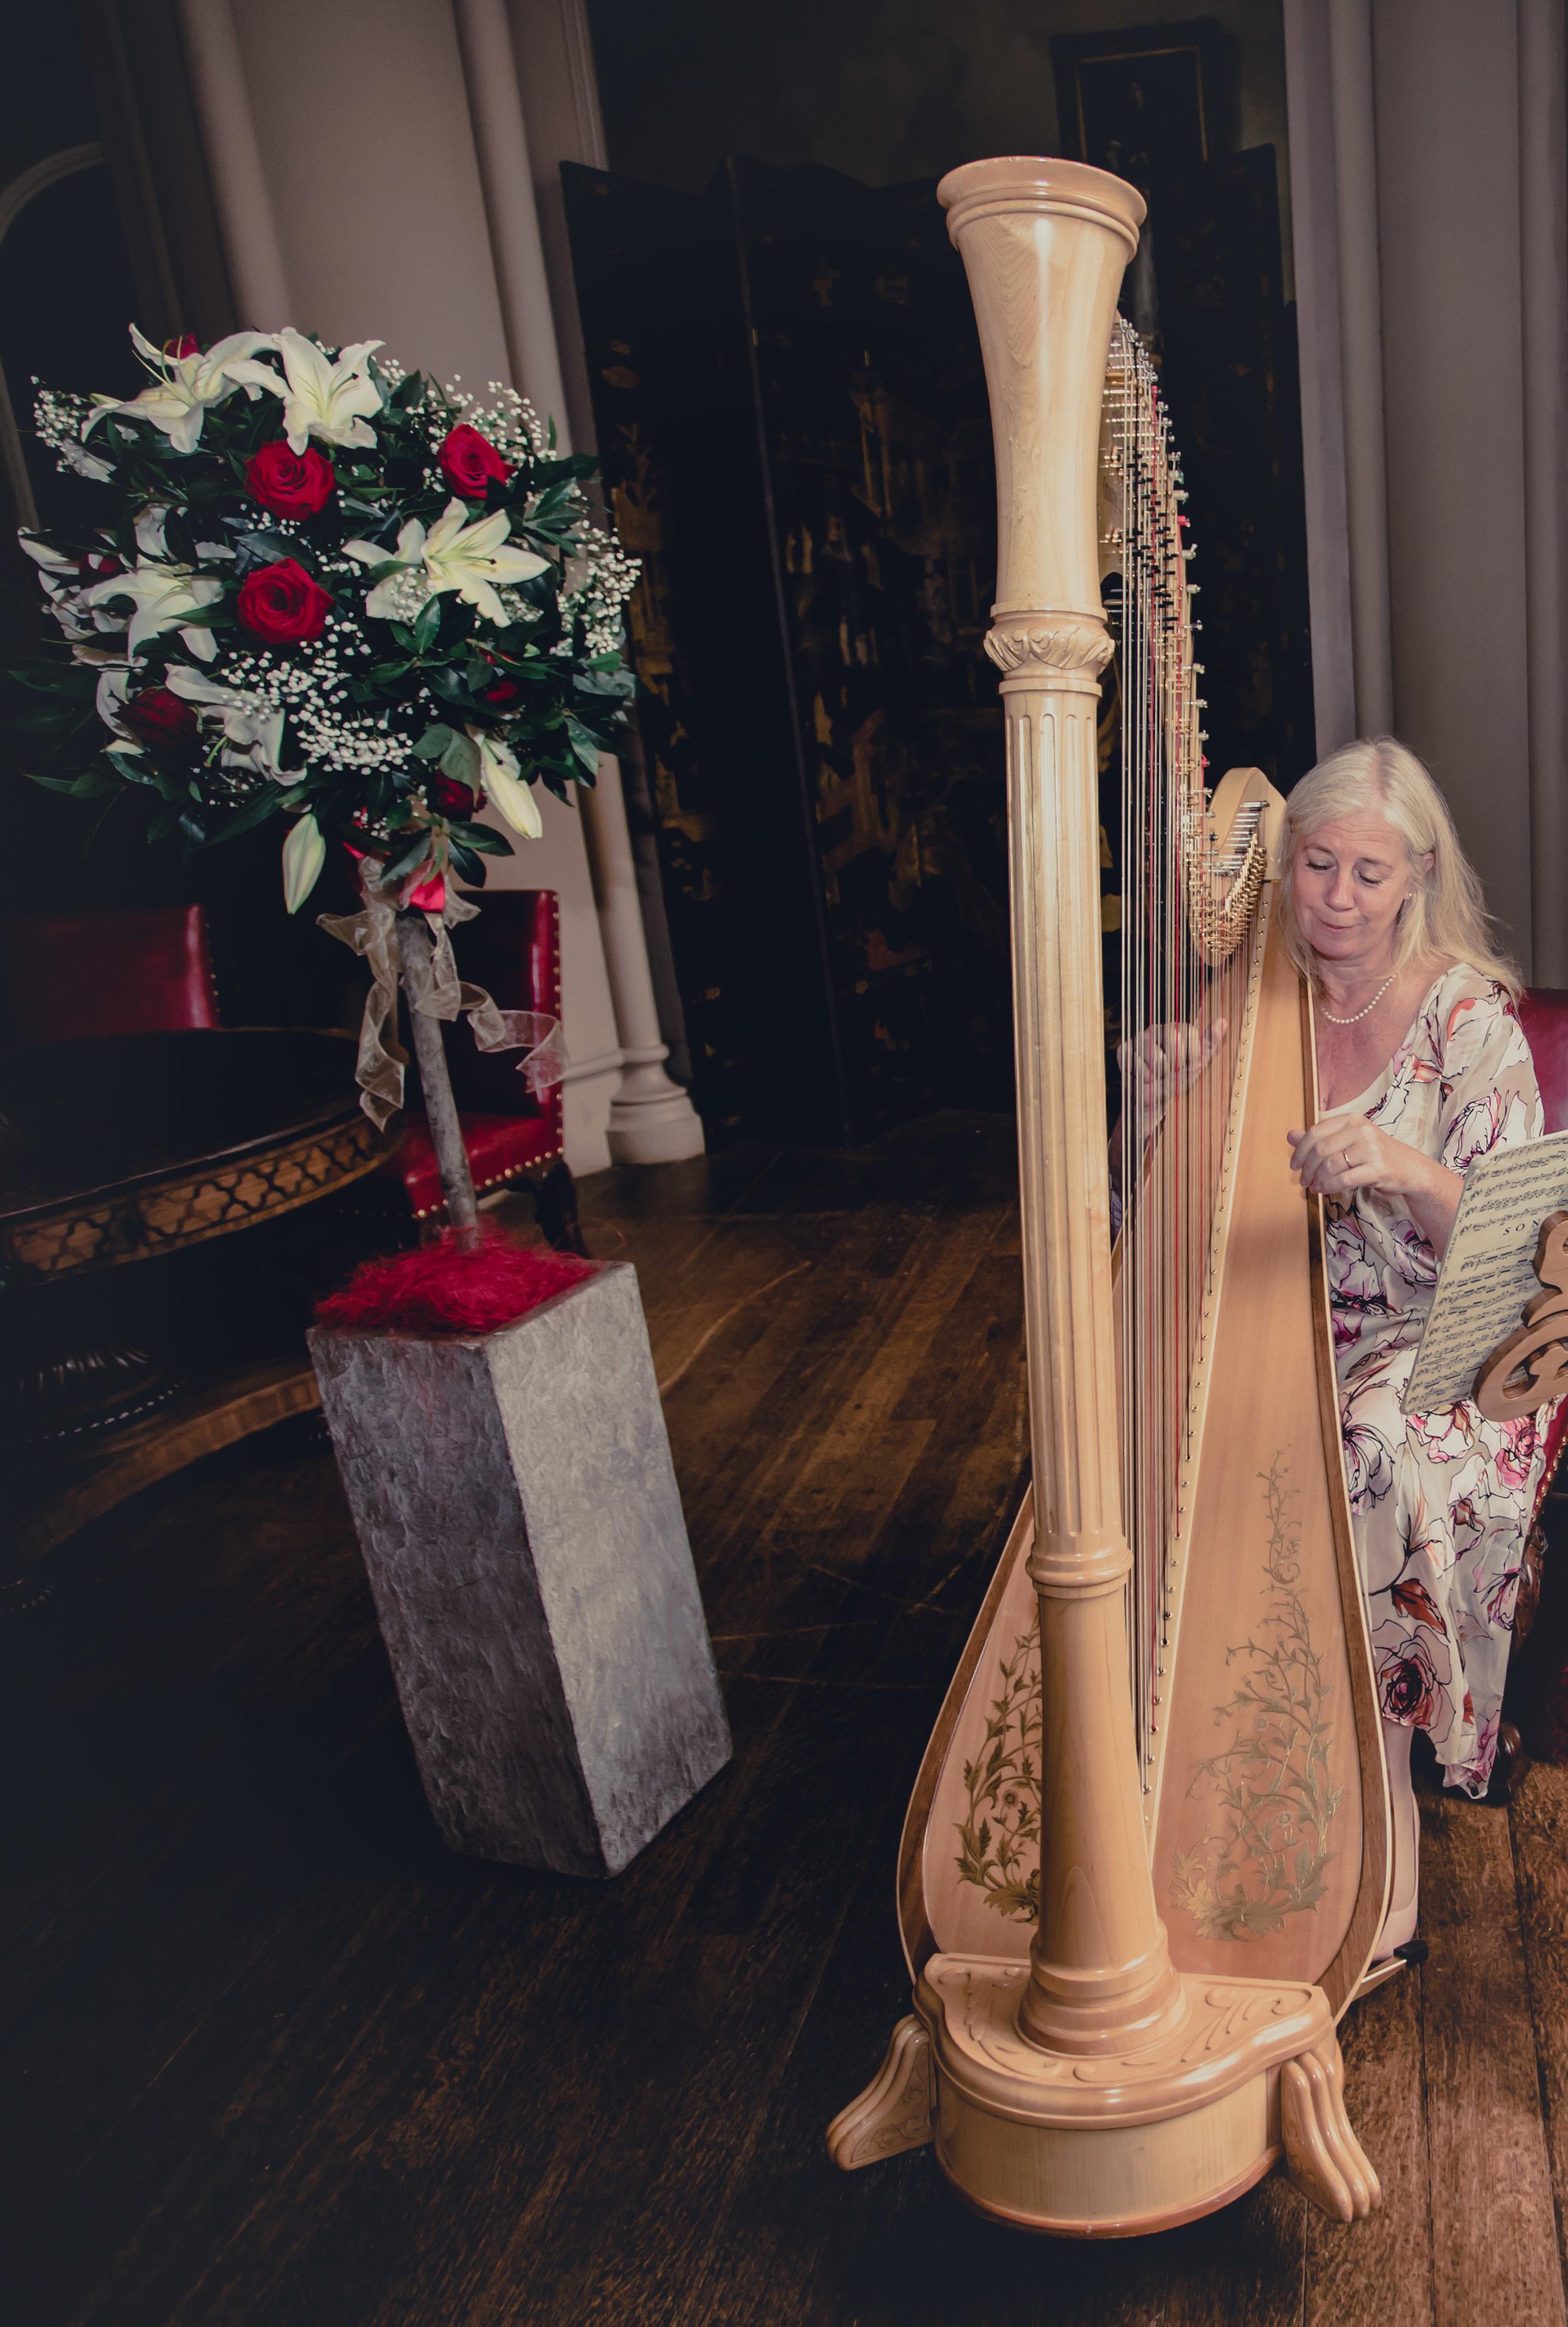 005  - Xenia Horne UK Harpist by Mark Pugh www.markpugh.com -6.JPG